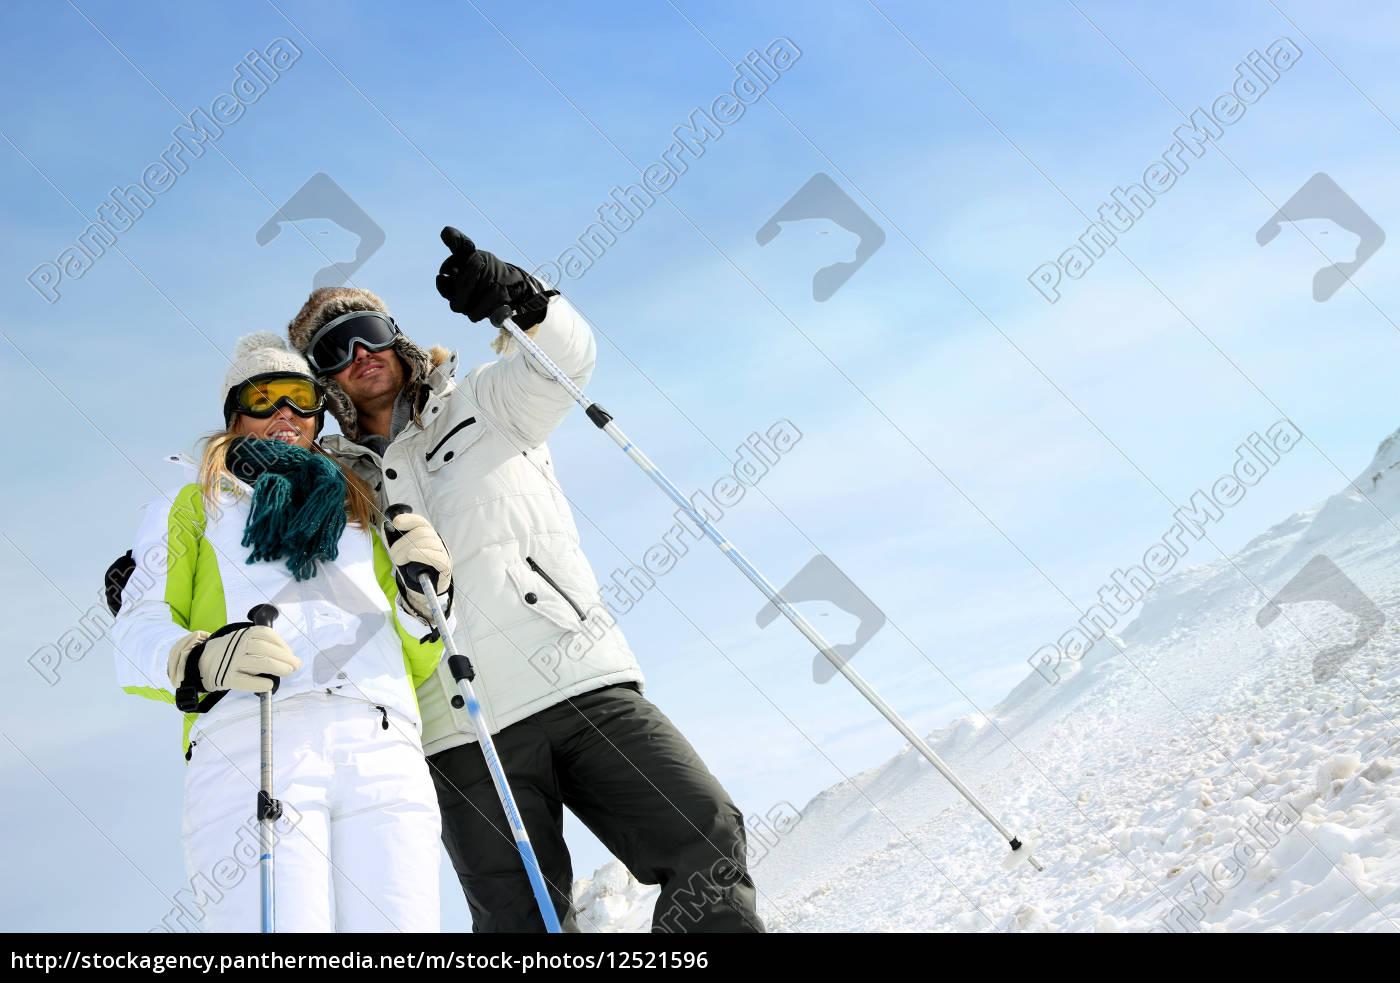 coupl, eof, skiers, on, ski, run - 12521596